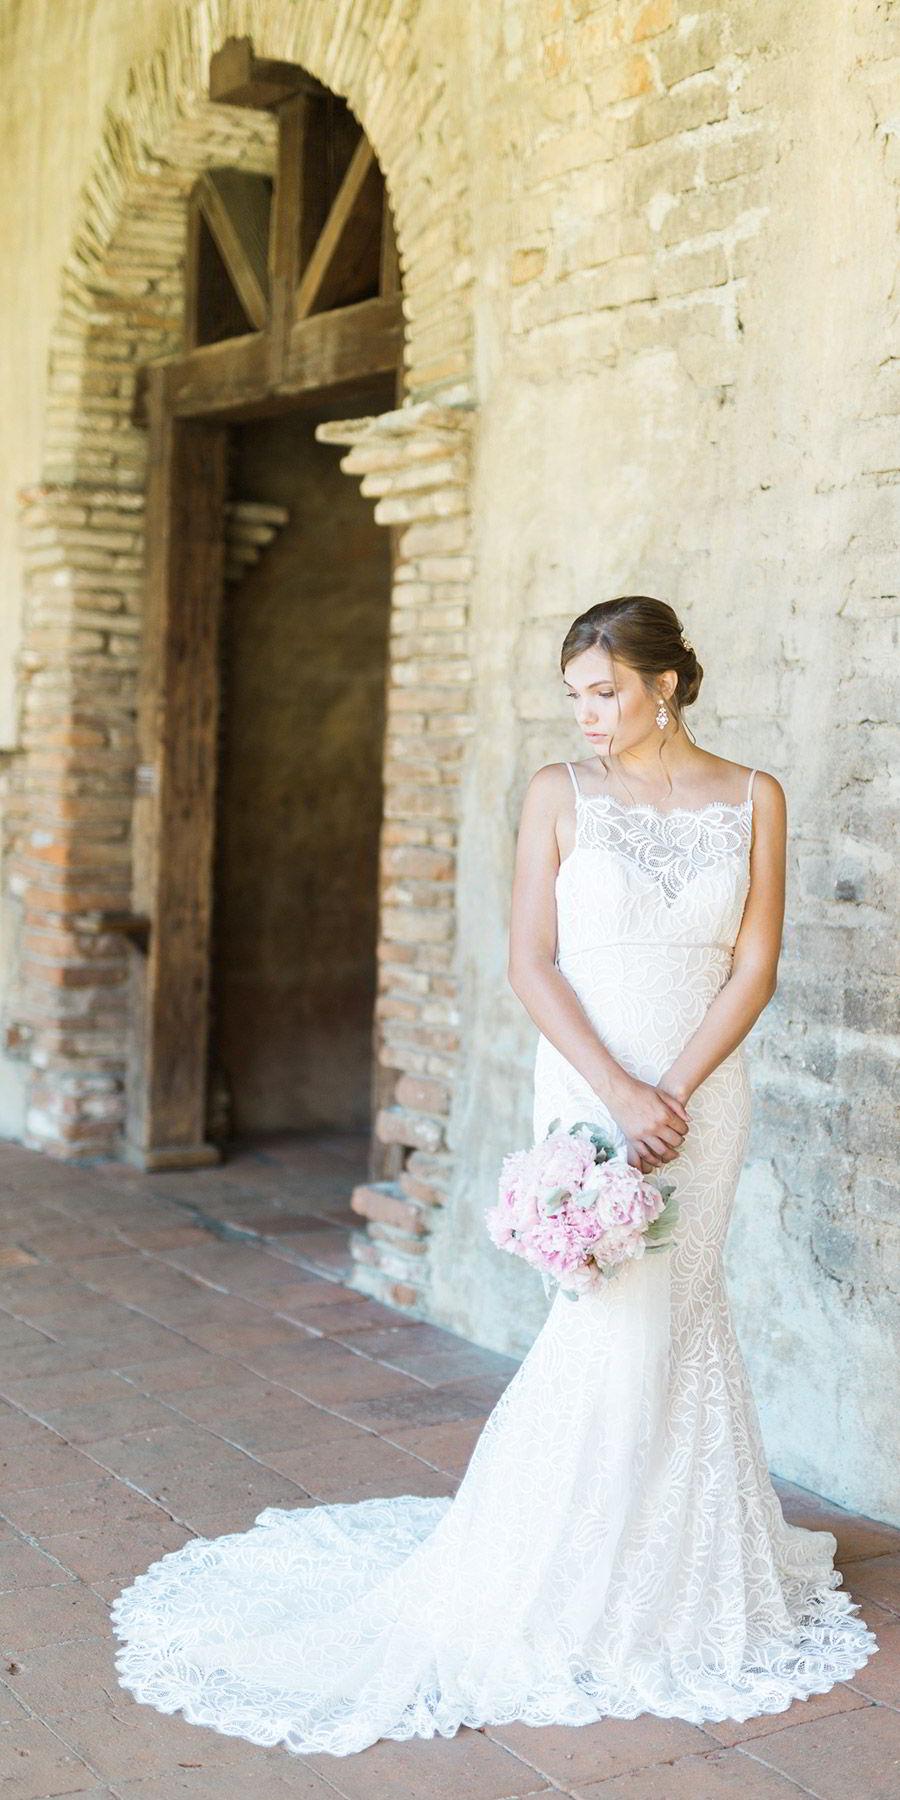 bel aire bridal accessories 6202 flower leaves comb earrings wedding dress train